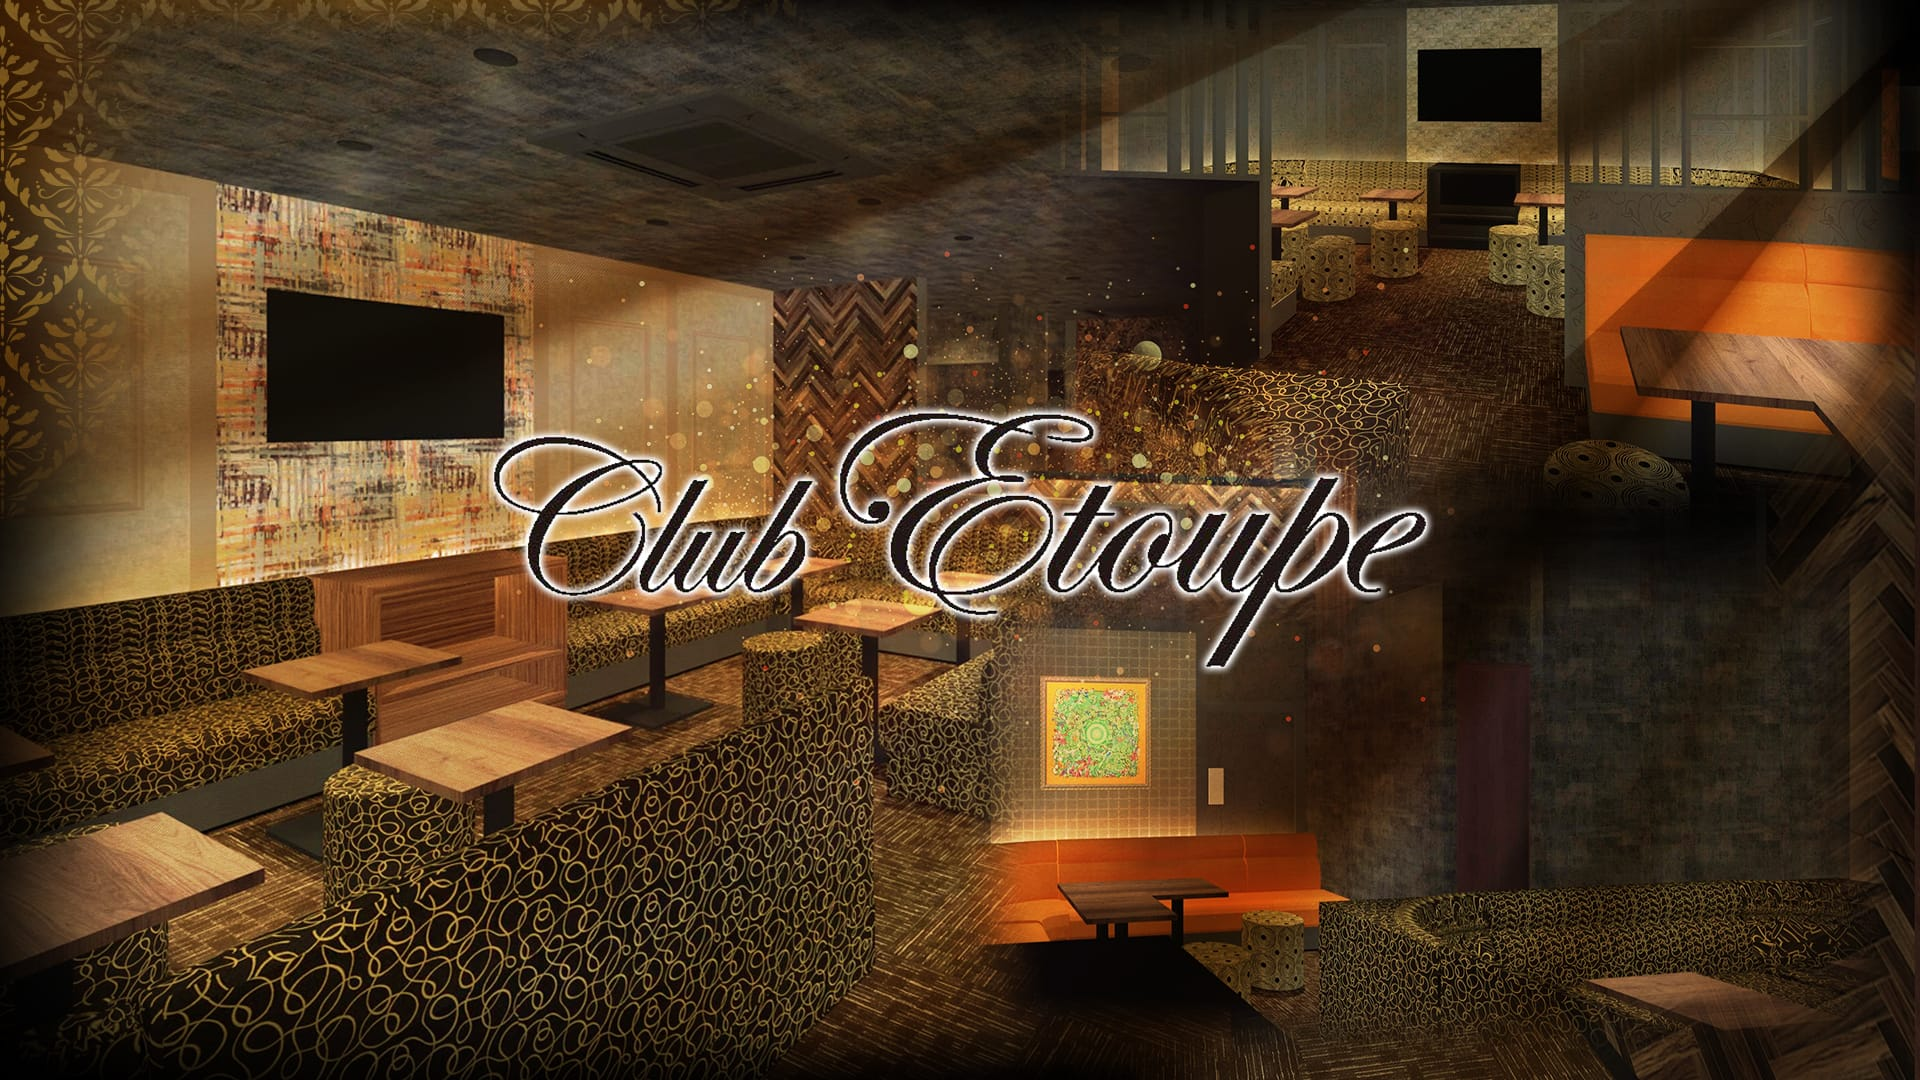 Club Etoupe(エトゥープ) 船橋キャバクラ TOP画像